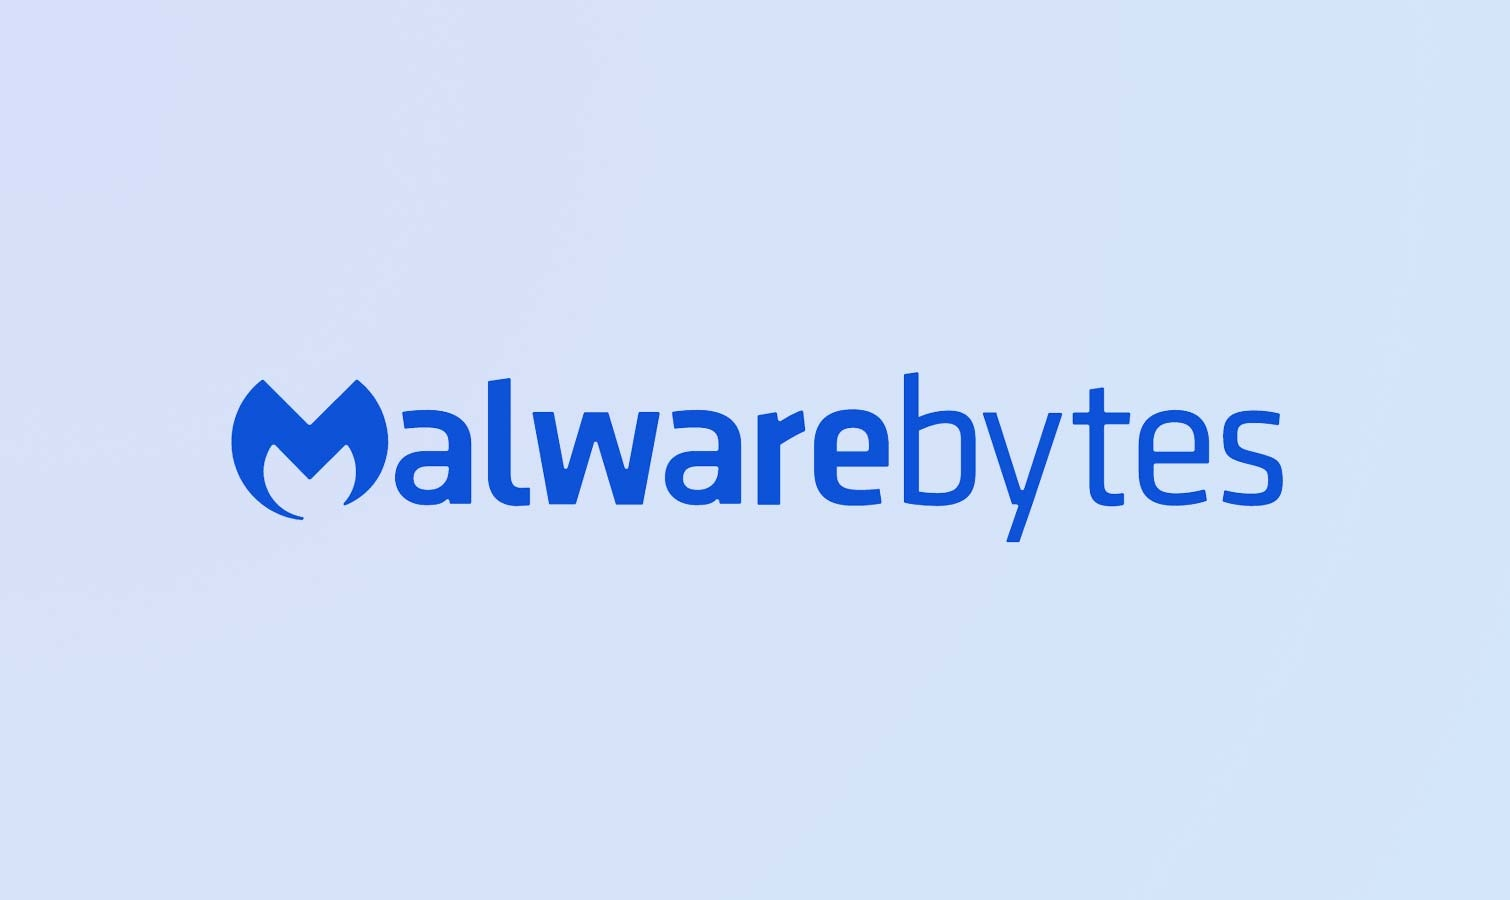 malwarebytes support (@malwarebytessupport1) Cover Image